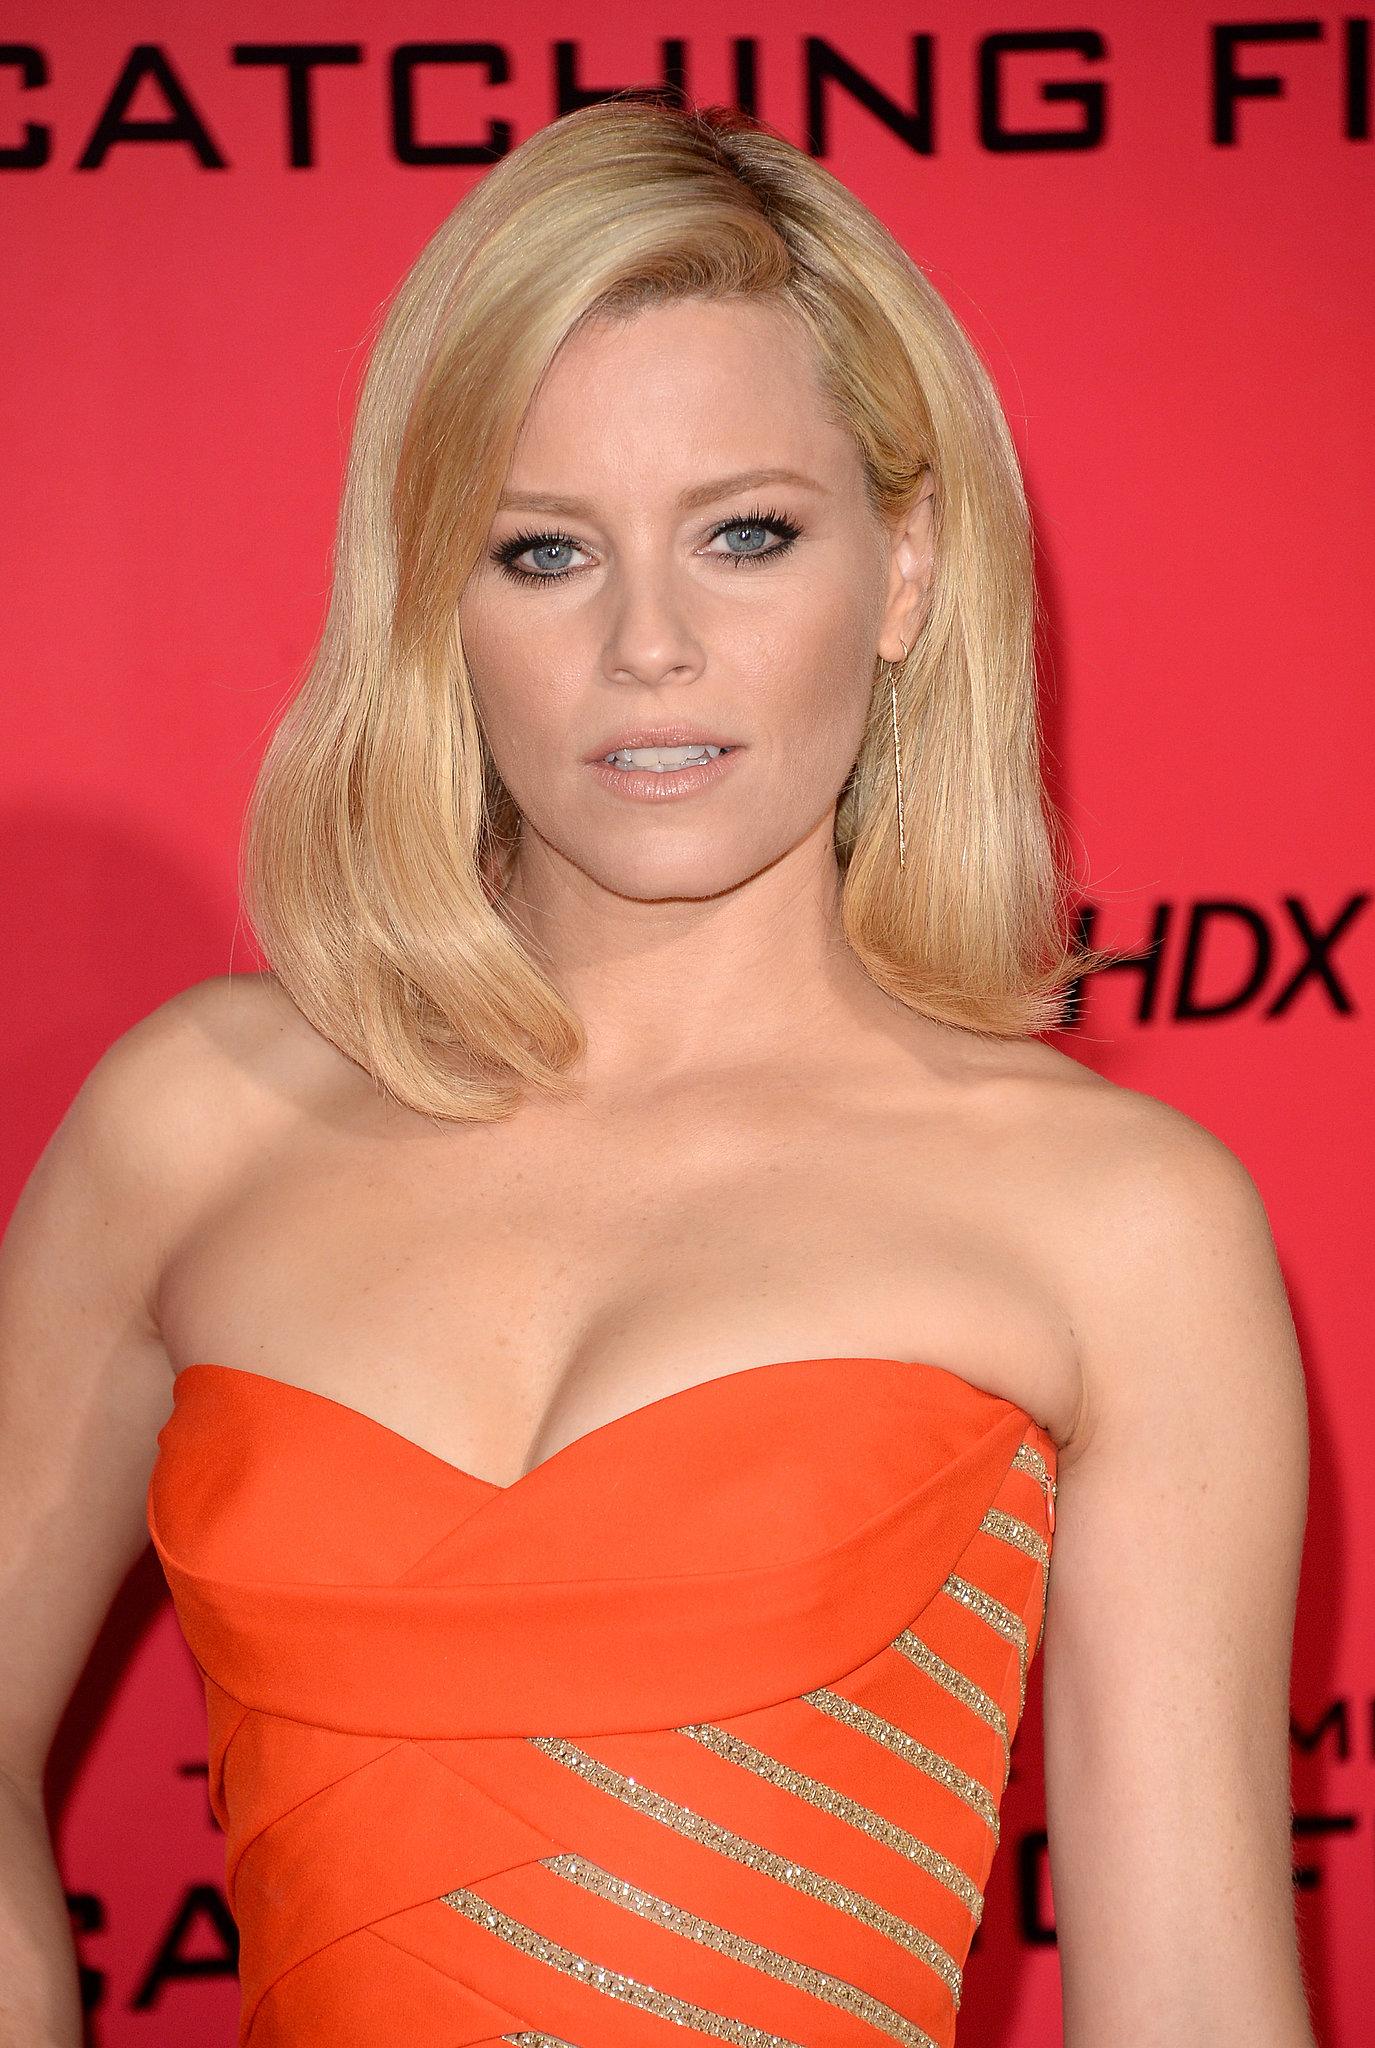 http://media1.popsugar-assets.com/files/2013/11/18/213/n/1922398/b4f6bd318a630664_450456007_10.xxxlarge_2x/i/Elizabeth-Banks-wore-flattering-orange-dress.jpg